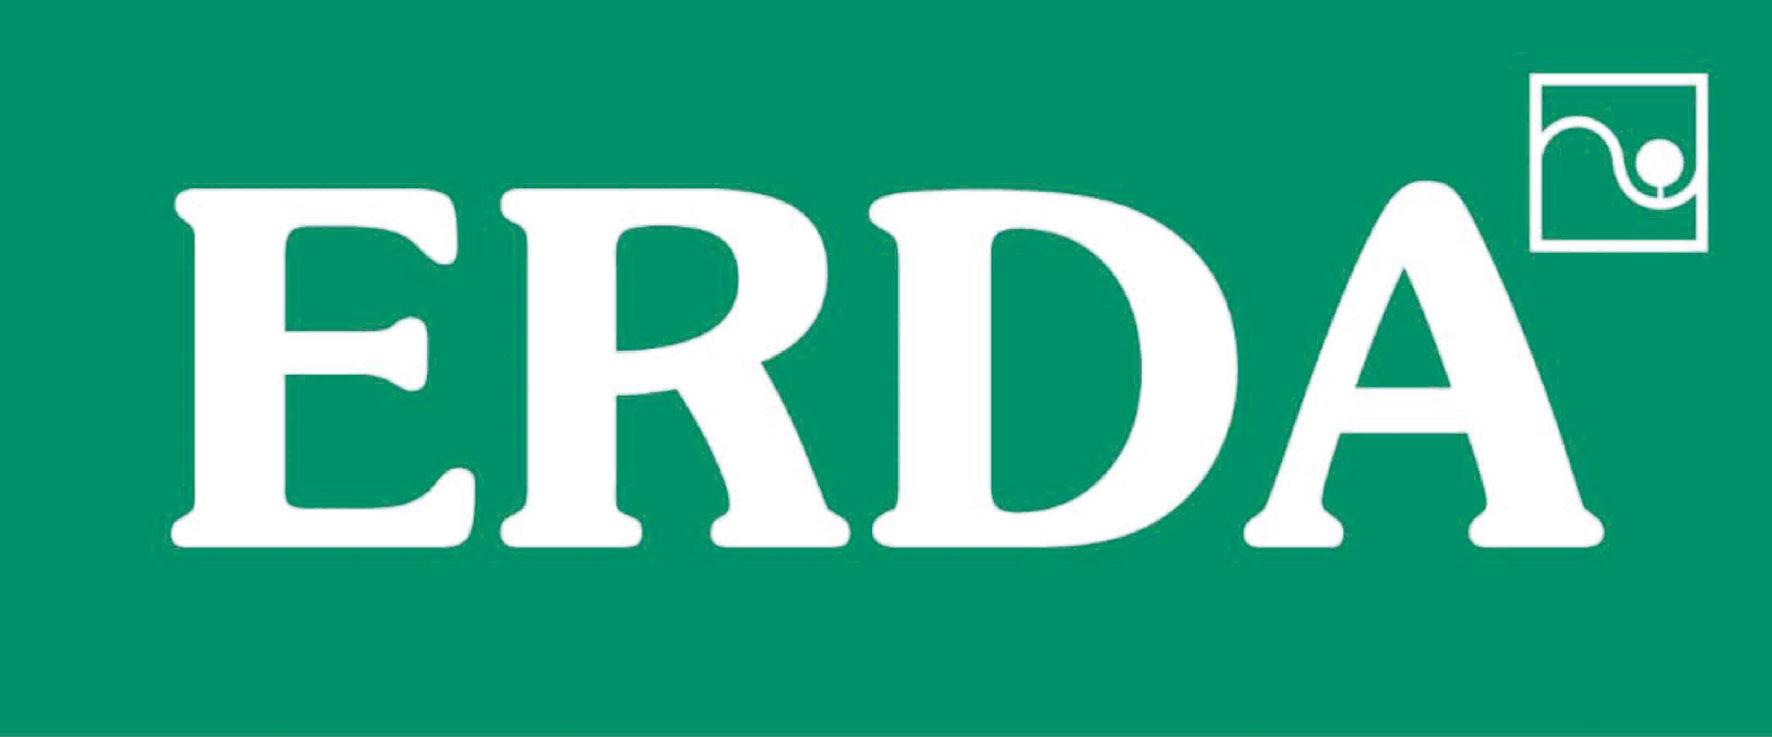 Sponsoren-Logos_Erda_1